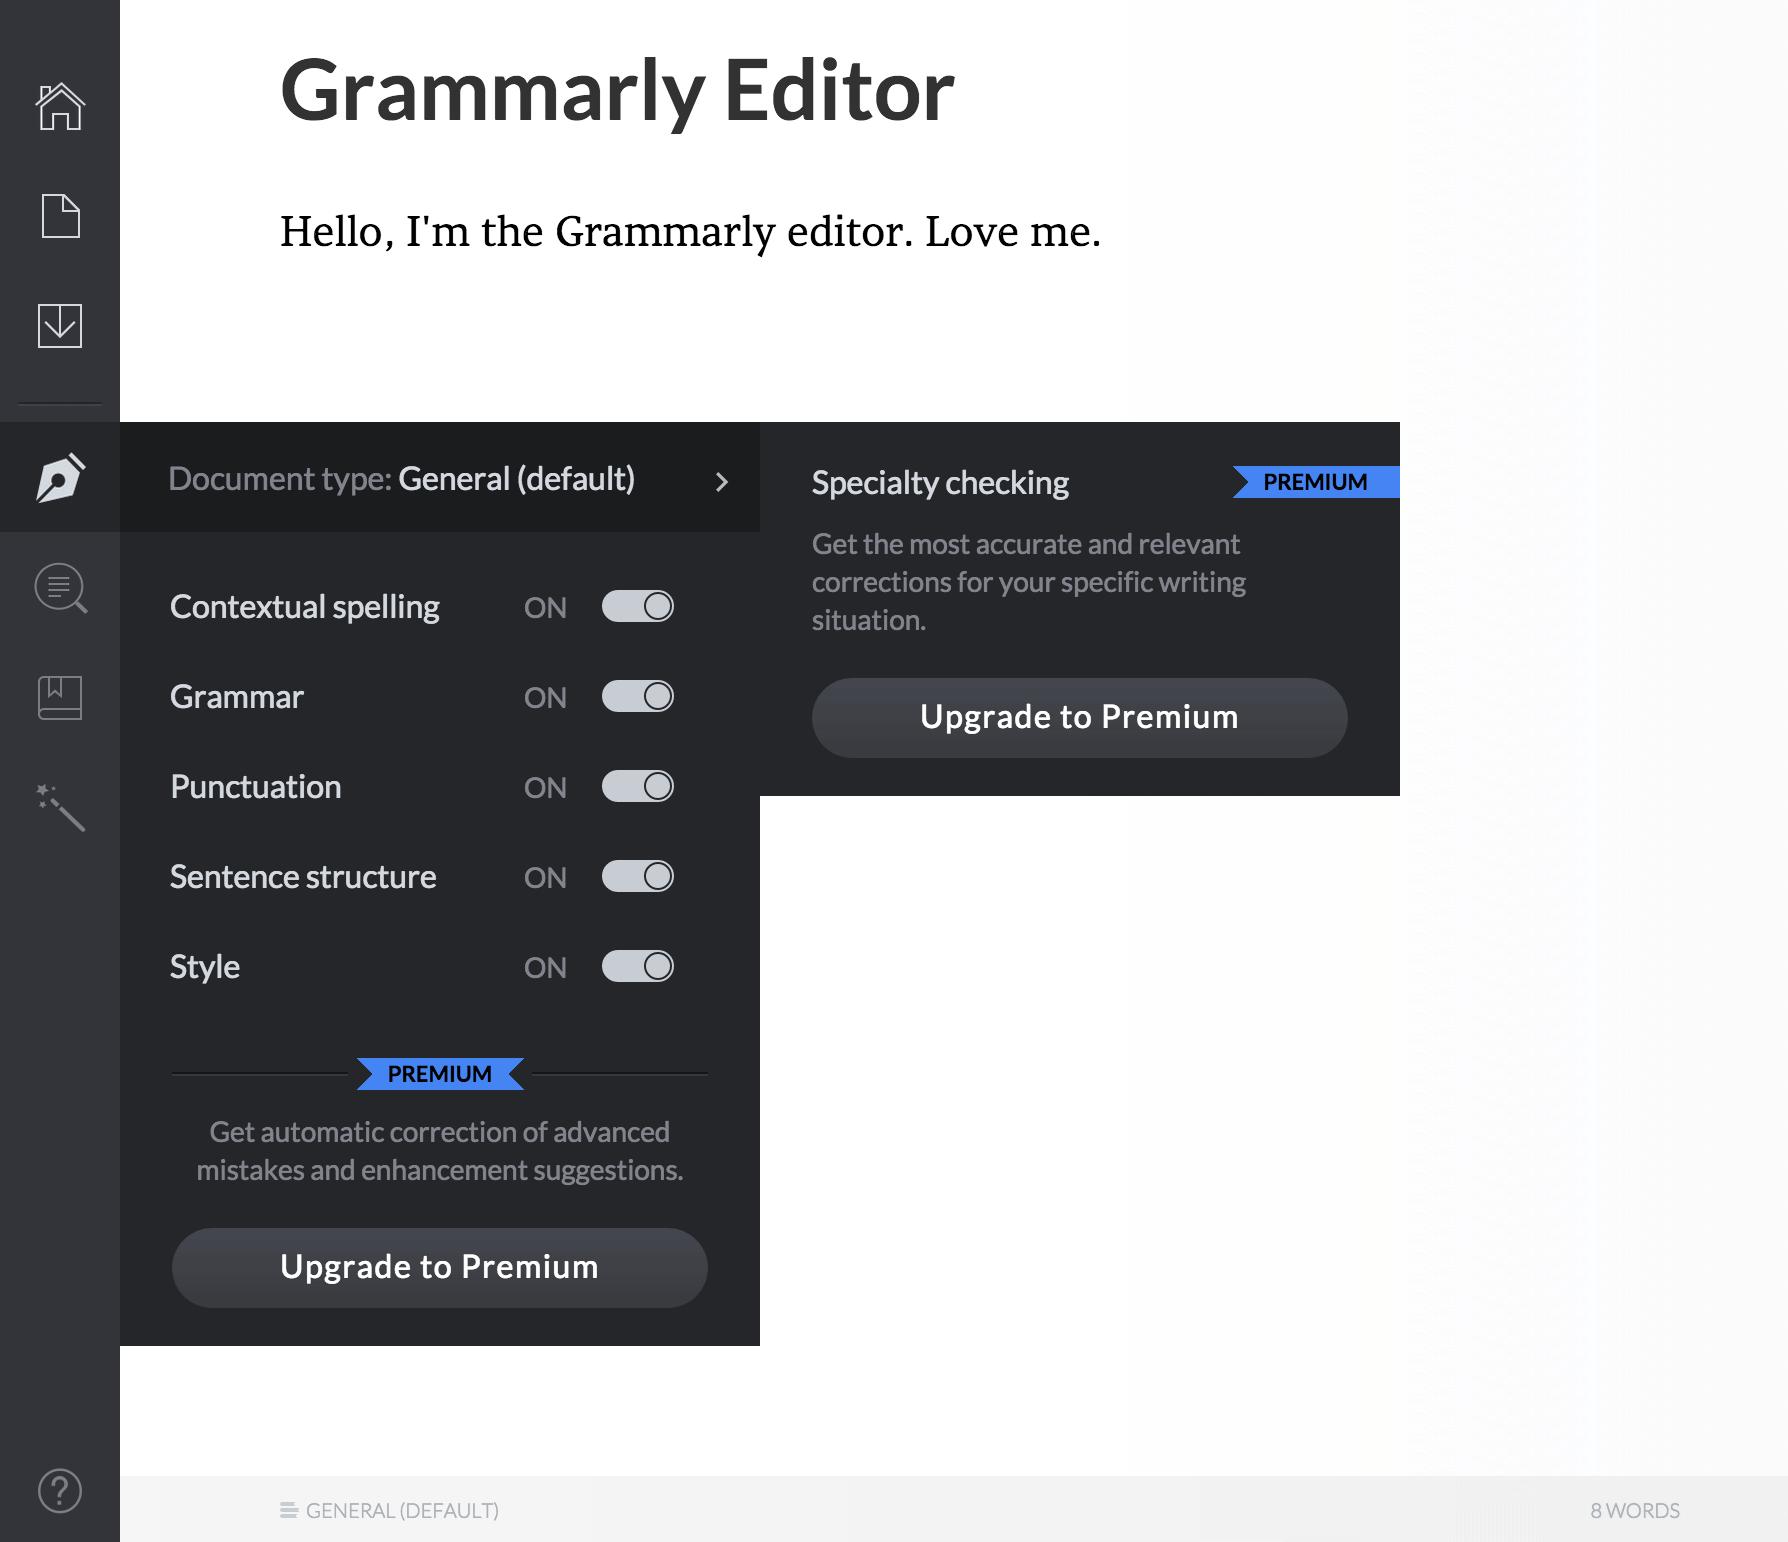 grammarly-editor